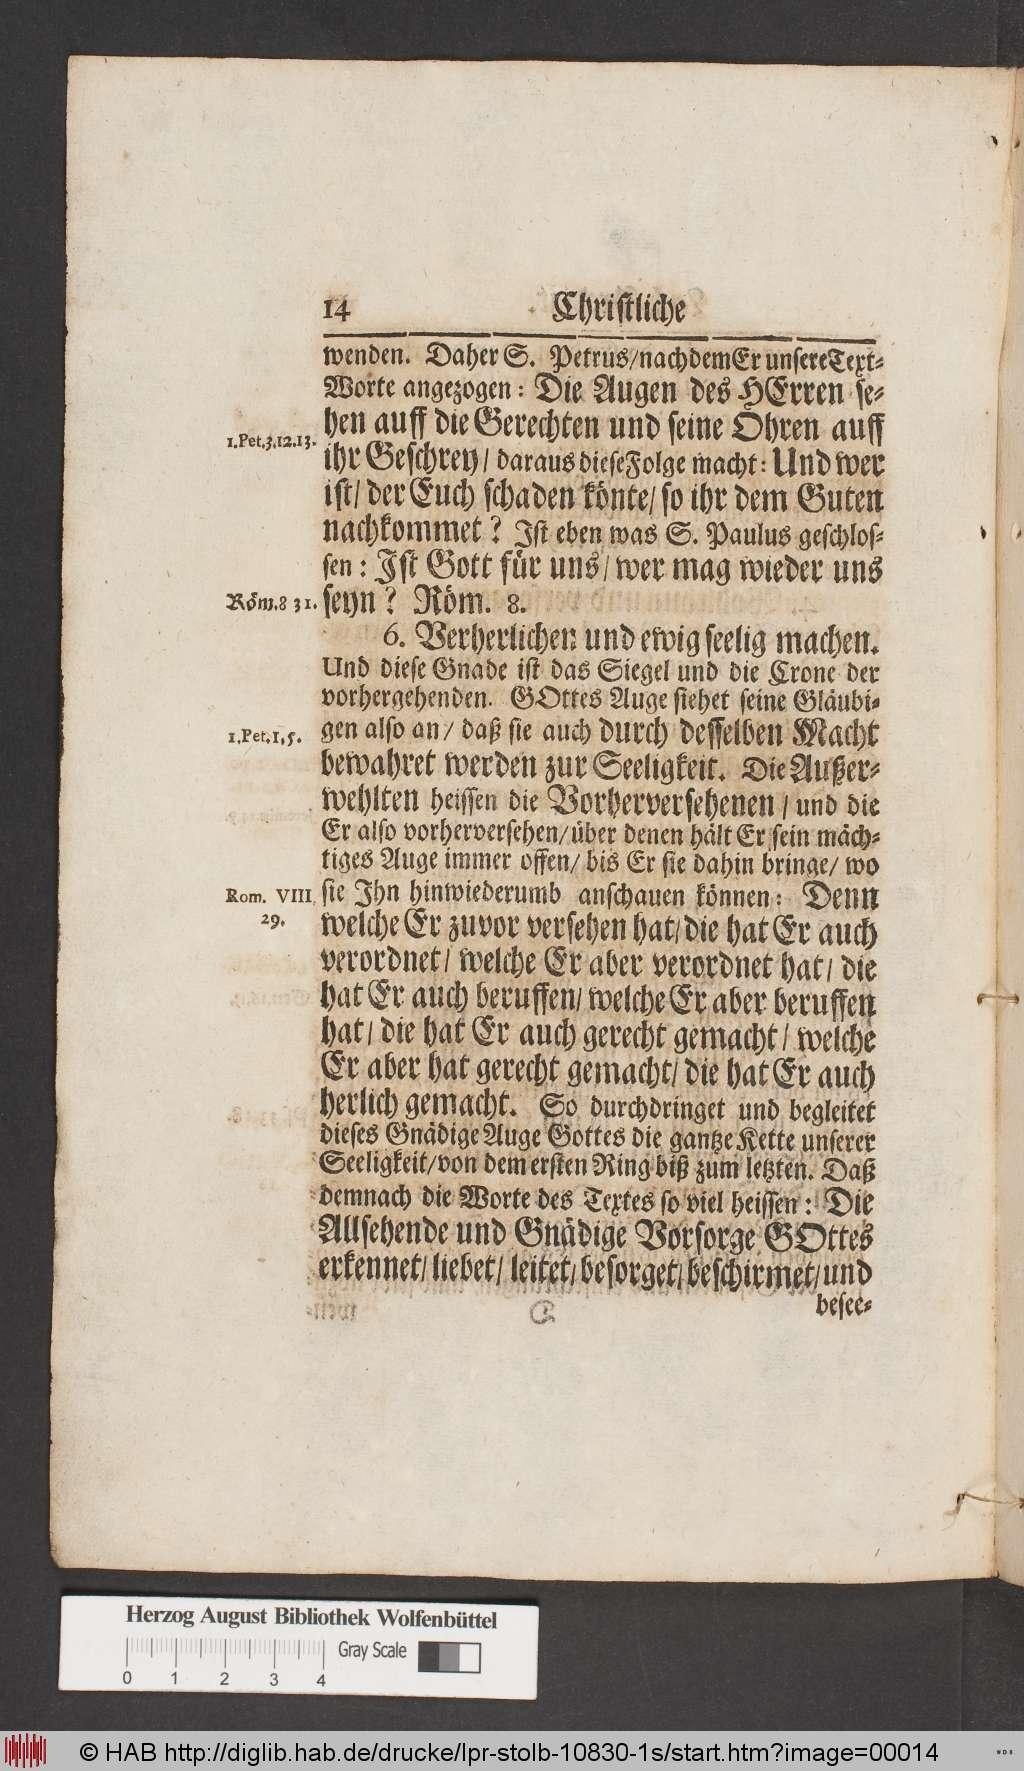 http://diglib.hab.de/drucke/lpr-stolb-10830-1s/00014.jpg